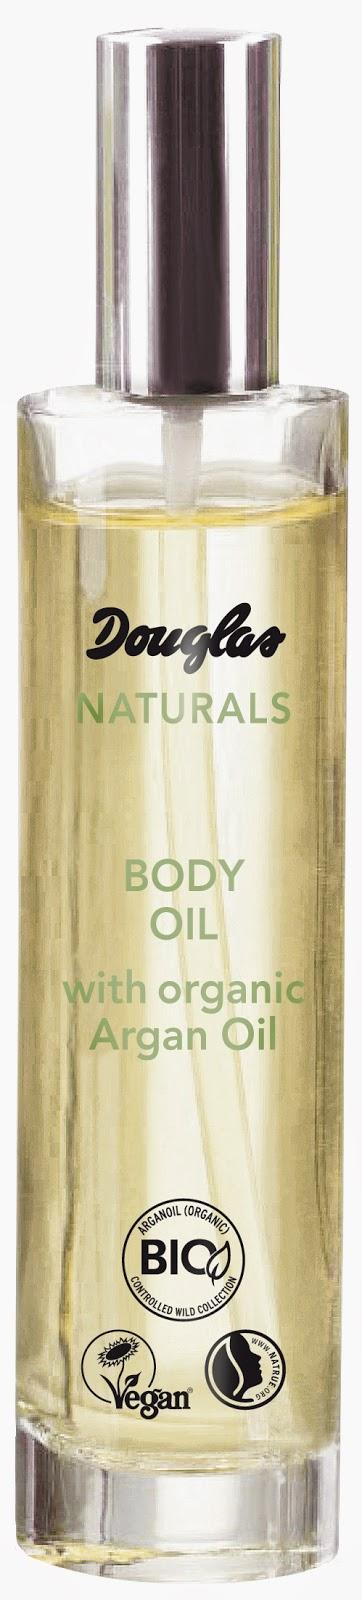 Douglas Naturals Body Oil